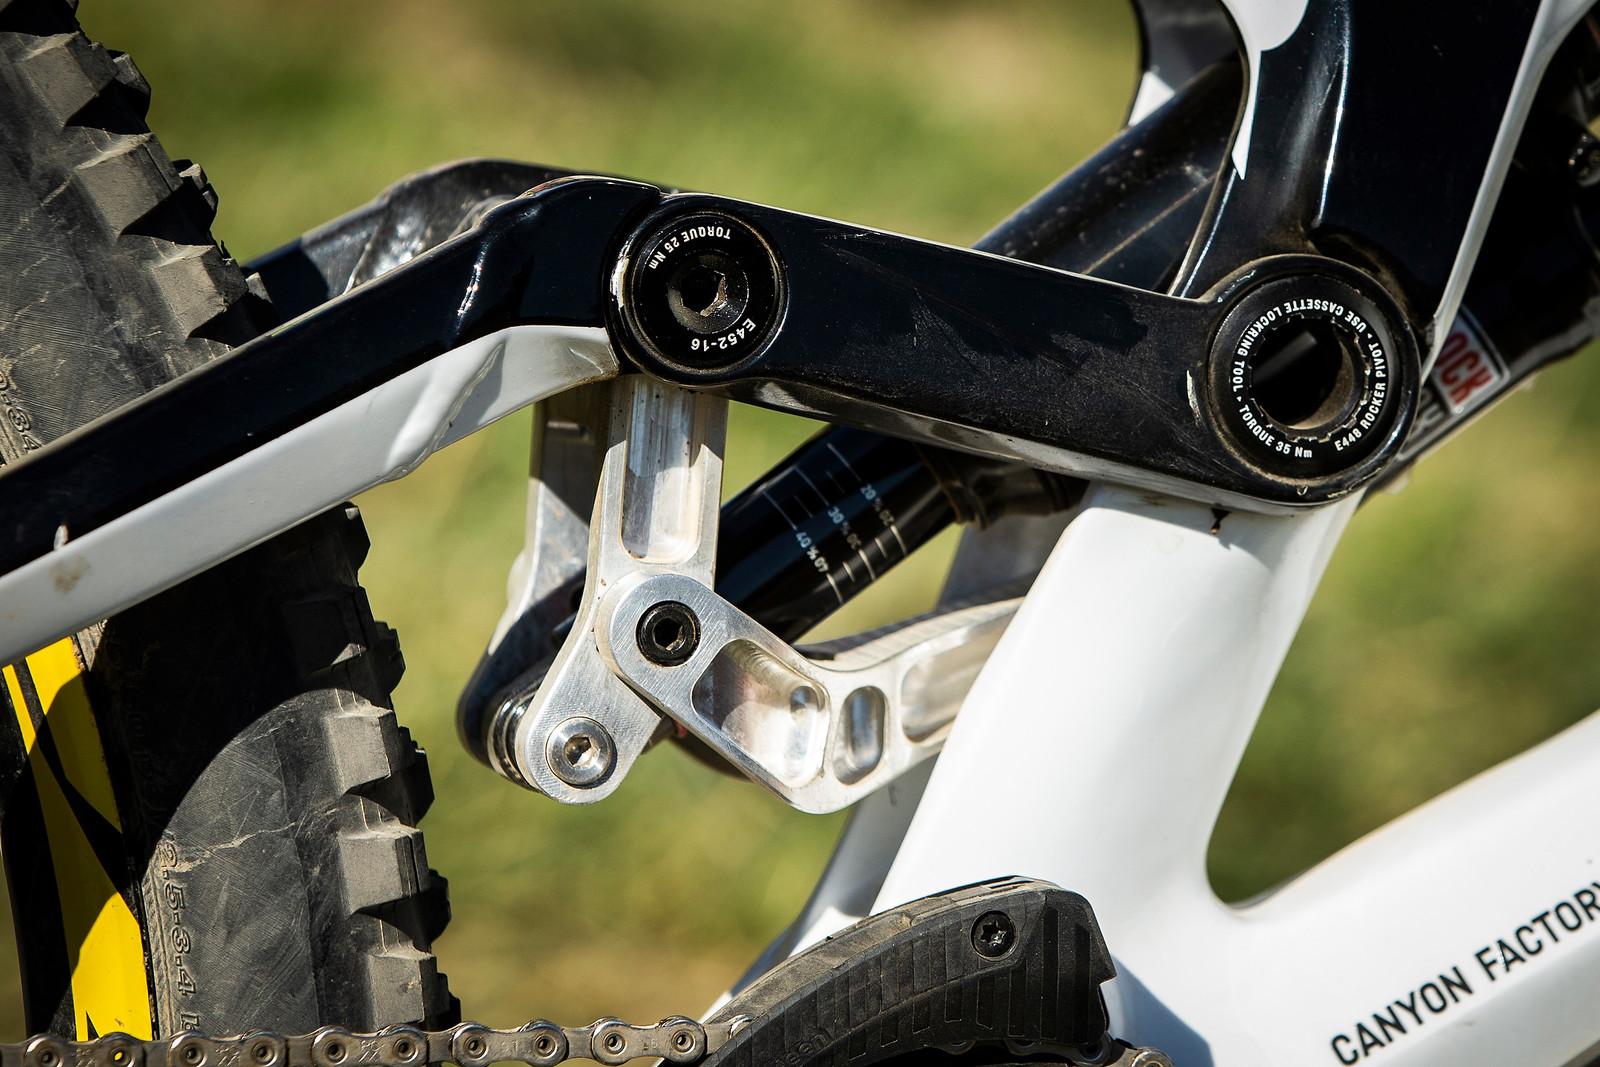 Troy Brosnan's Custom Canyon Sender Linkage - WINNING BIKE - Troy Brosnan's Canyon Sender - Mountain Biking Pictures - Vital MTB